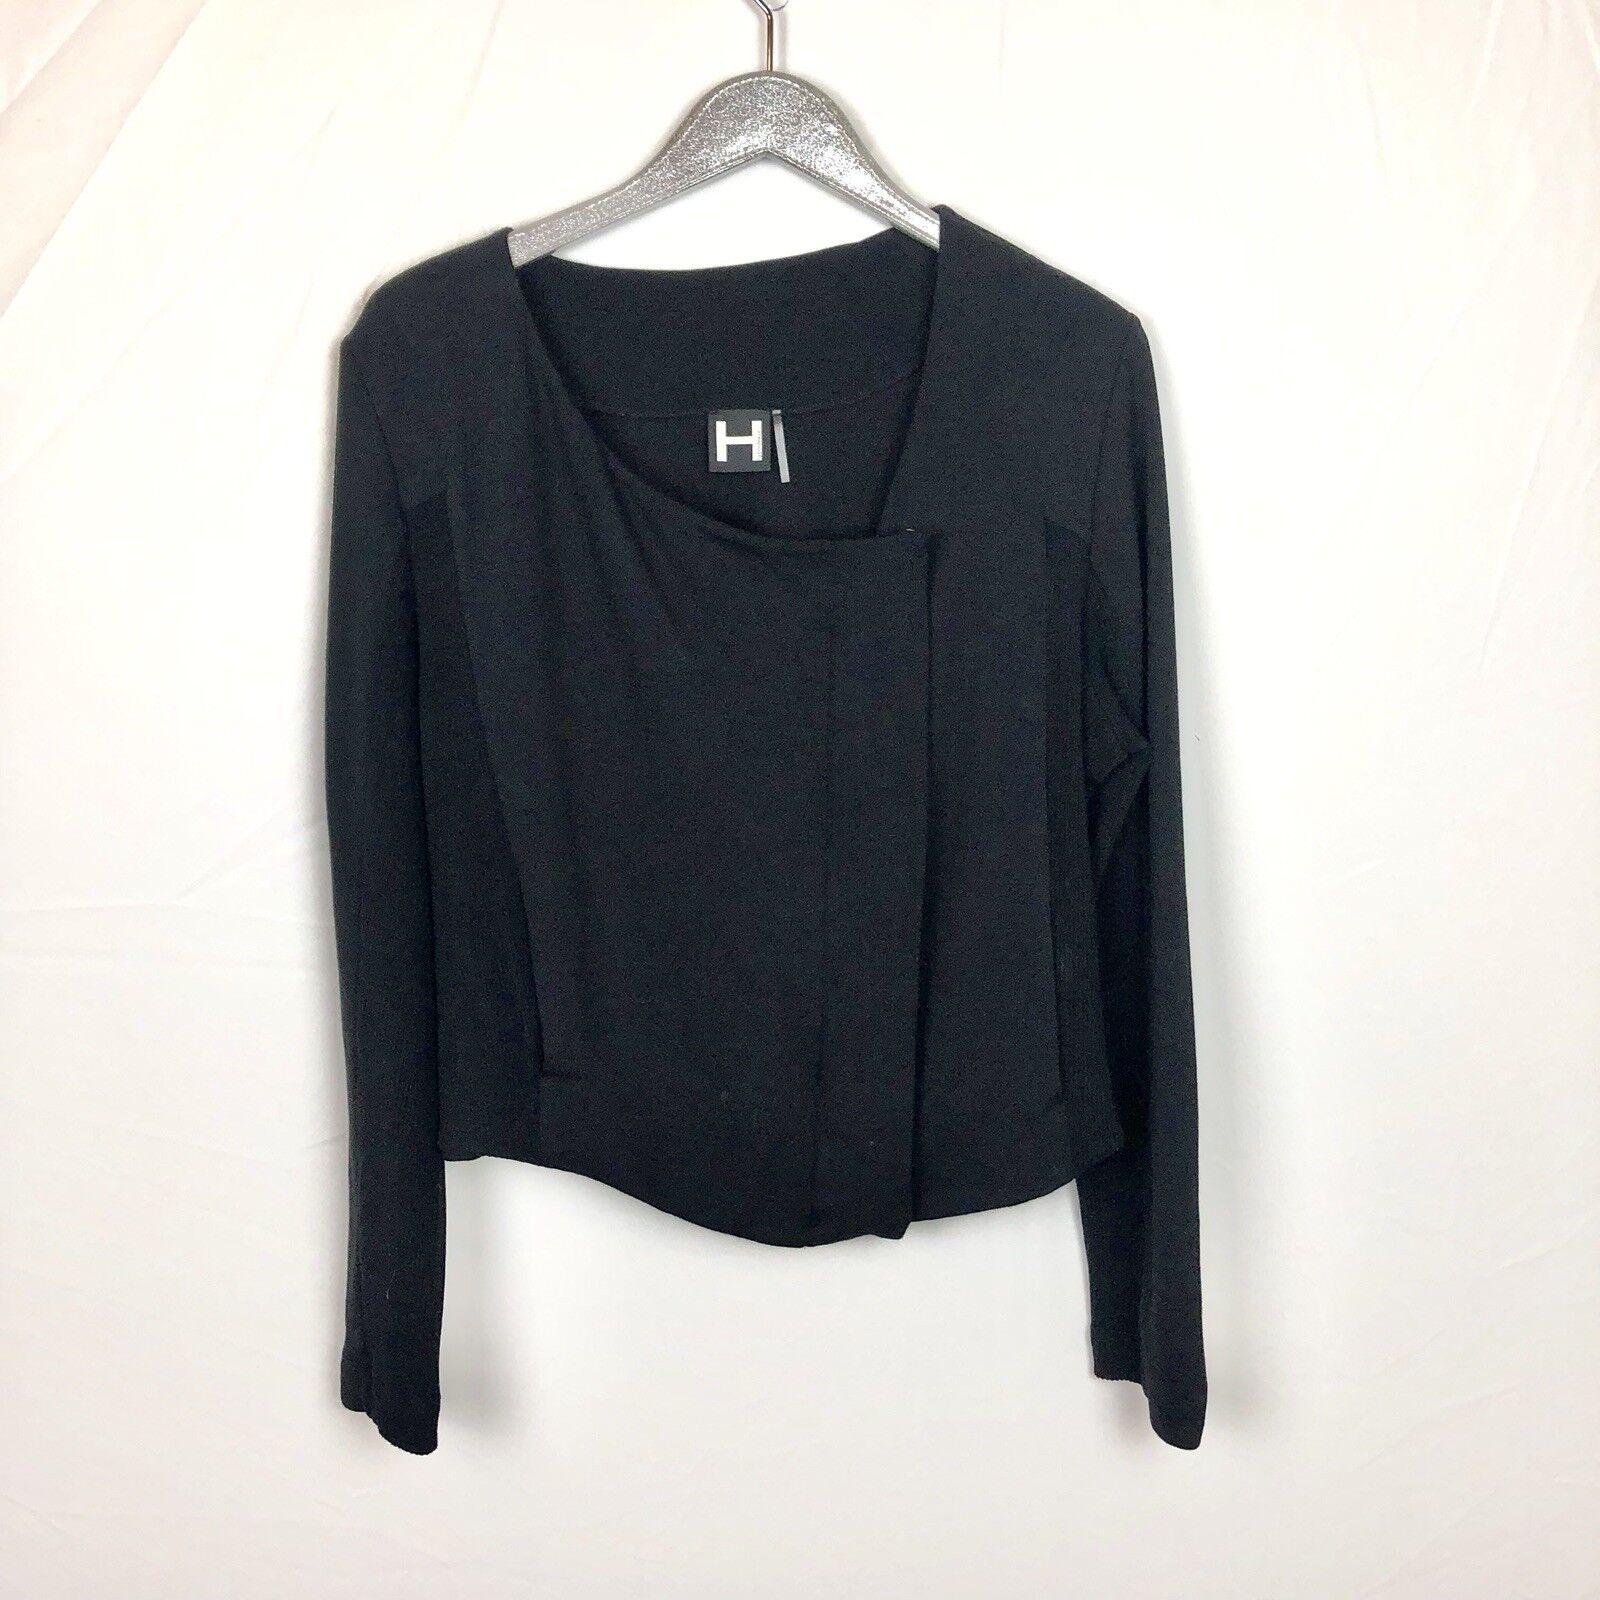 H By Bordeaux Black Collarless Assymetrical Snap Zip Soft Jacket Size Large L